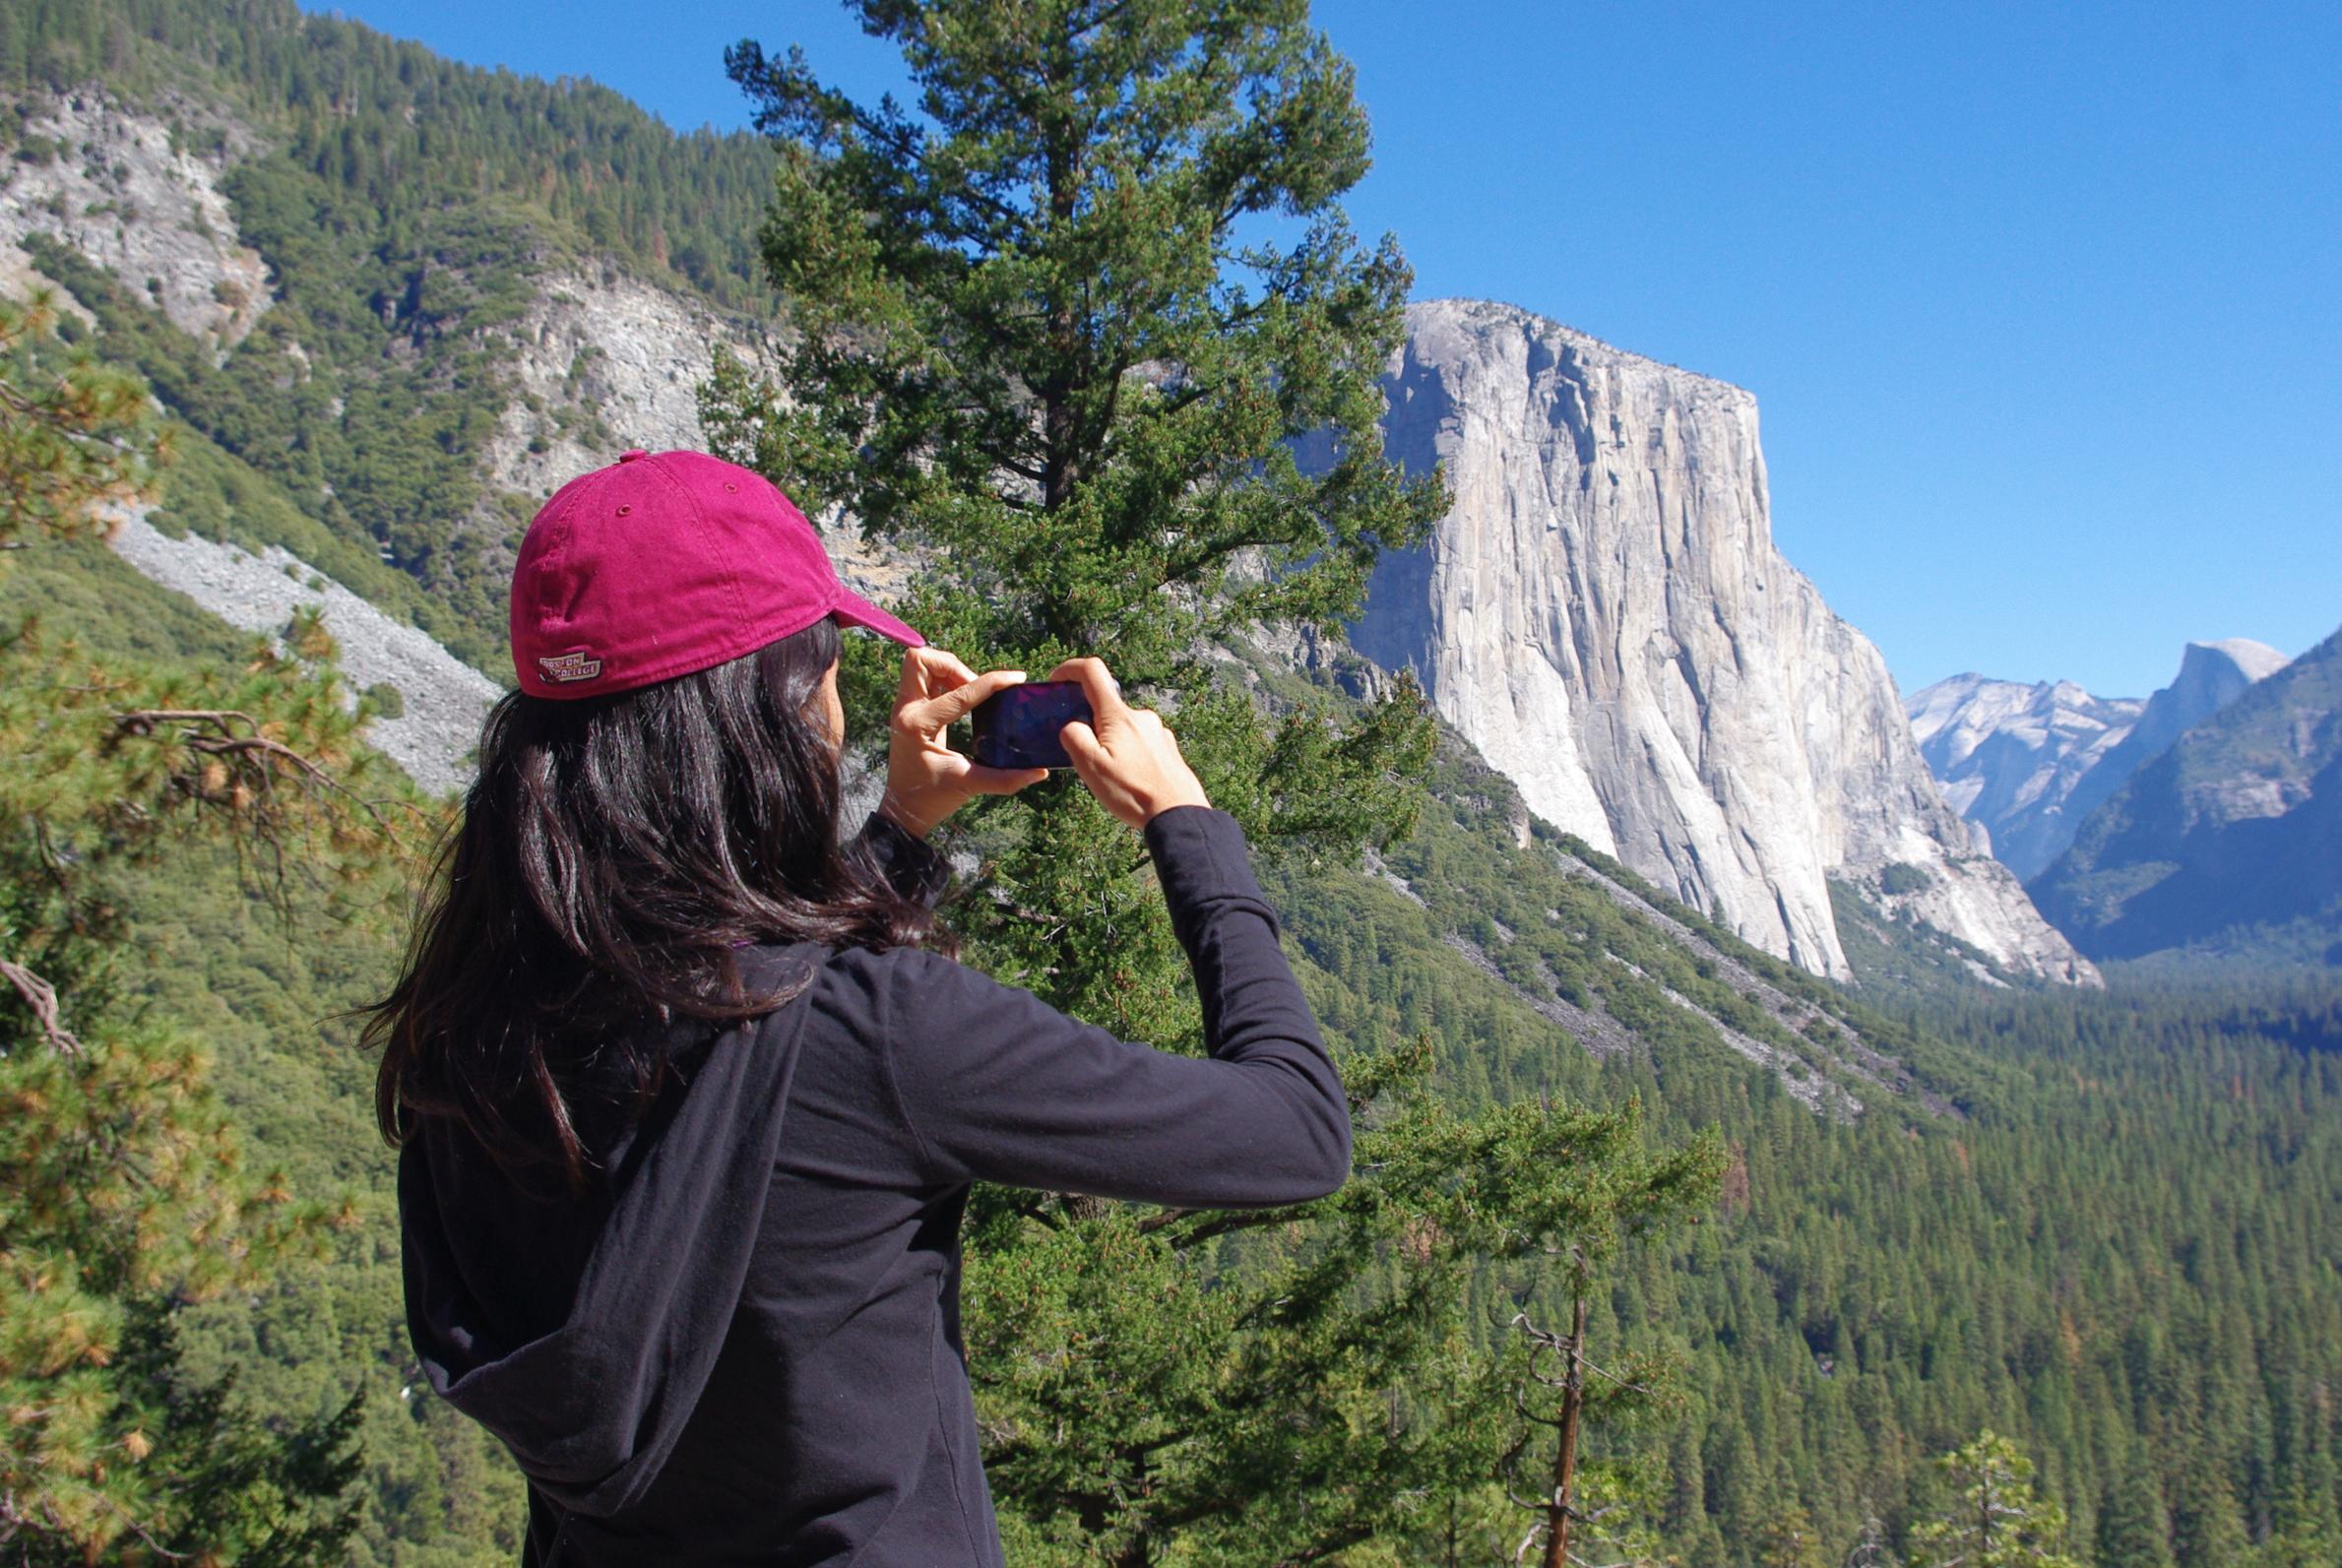 Yosemite National Park Tunnel View Jen's Bucket List